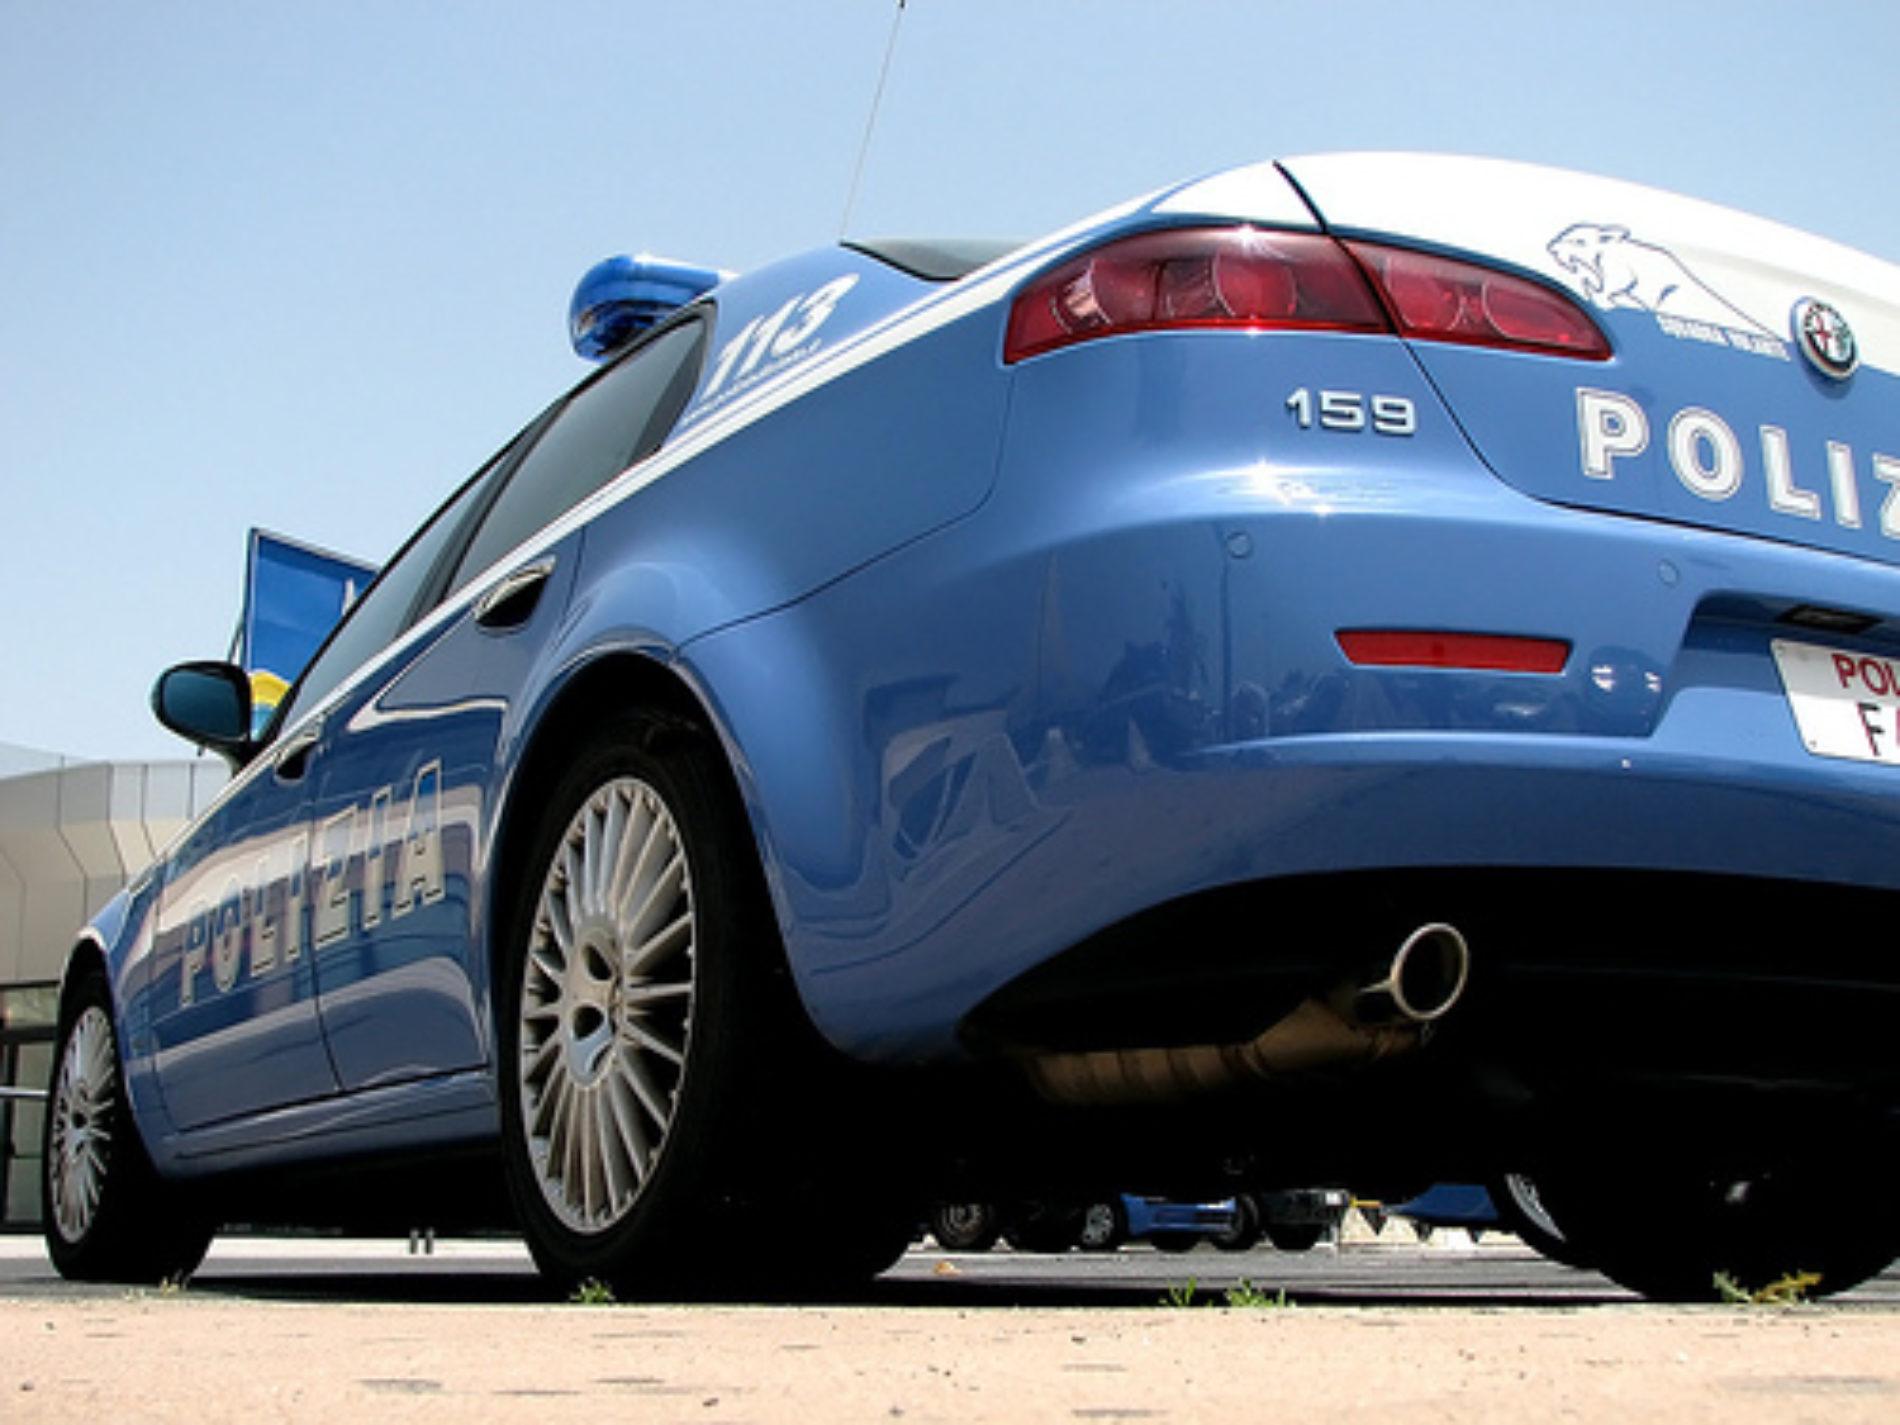 Autostrada A 19: Polizia sequestra ingente quantità di cocaina